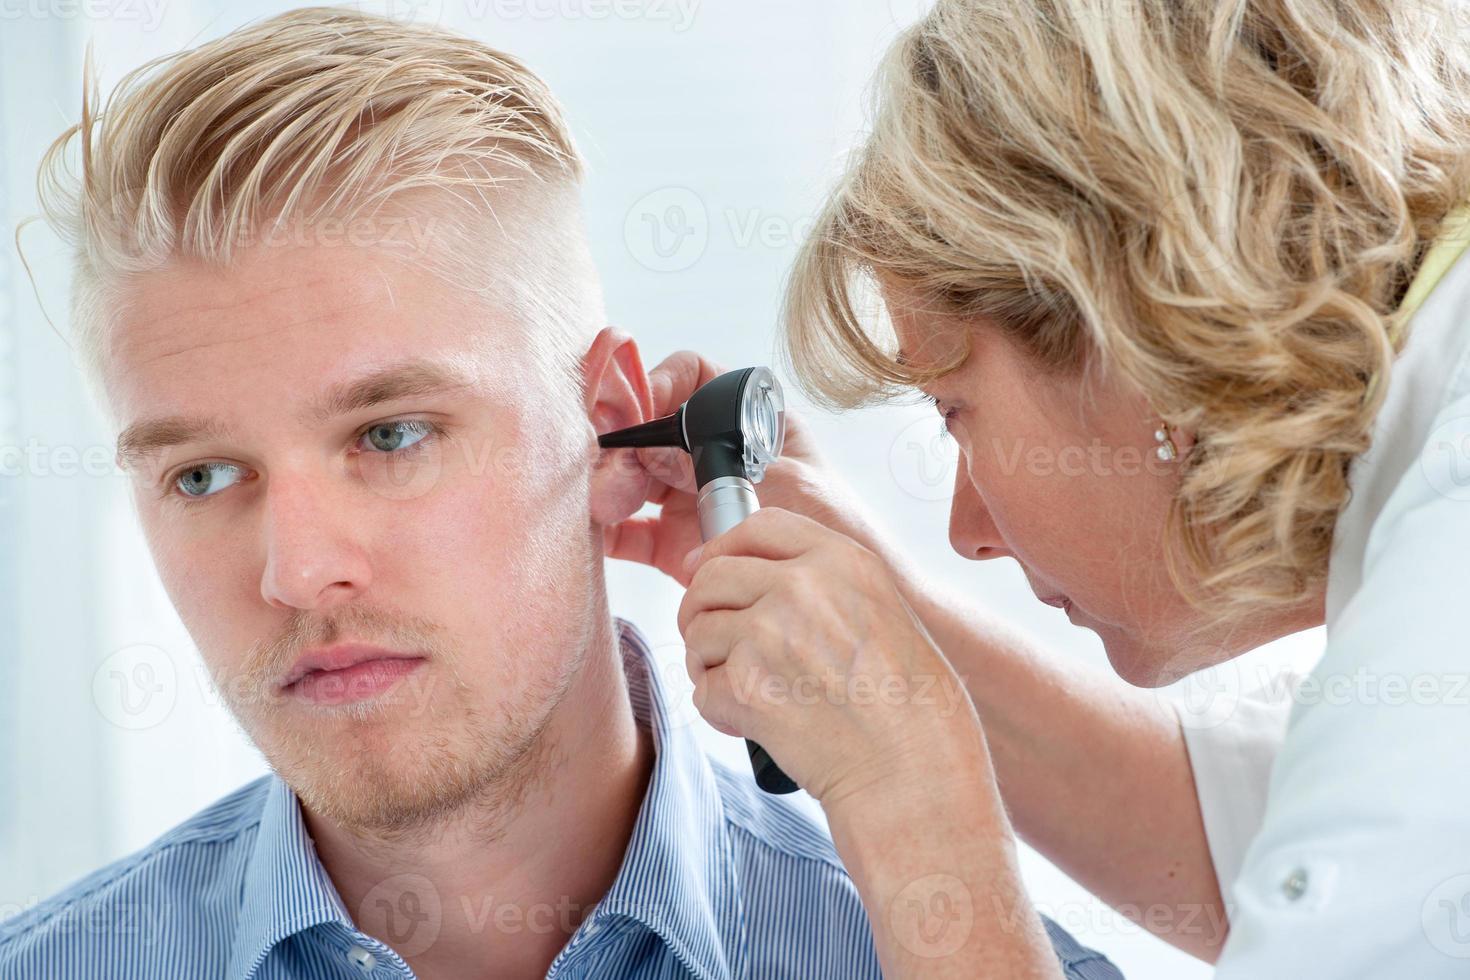 examen de l'oreille photo